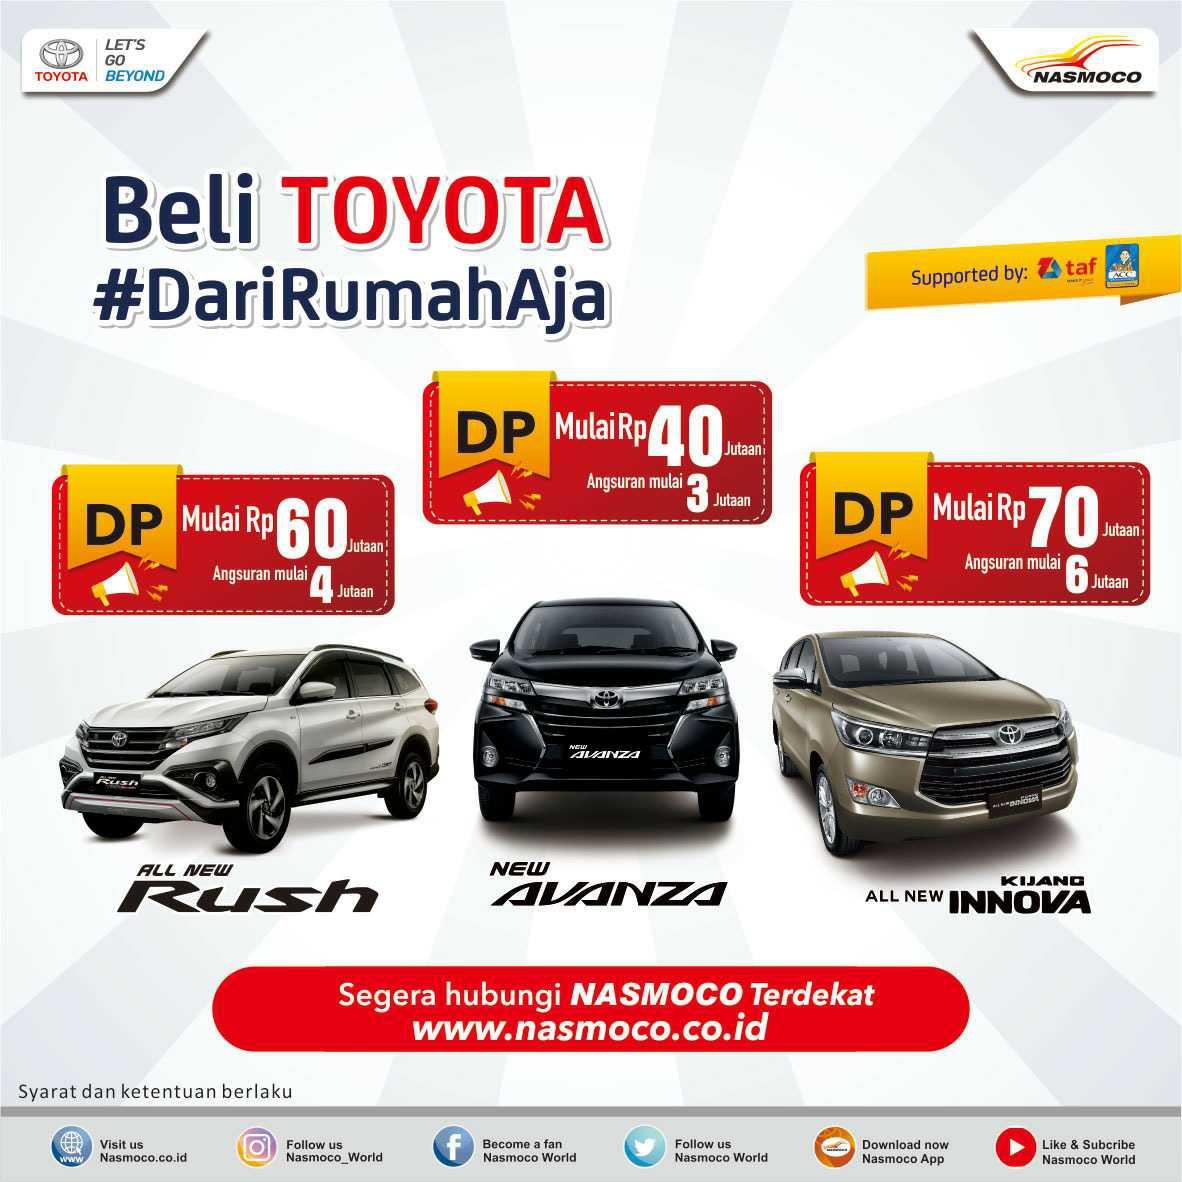 Promo Akhir Tahun Toyota Semarang